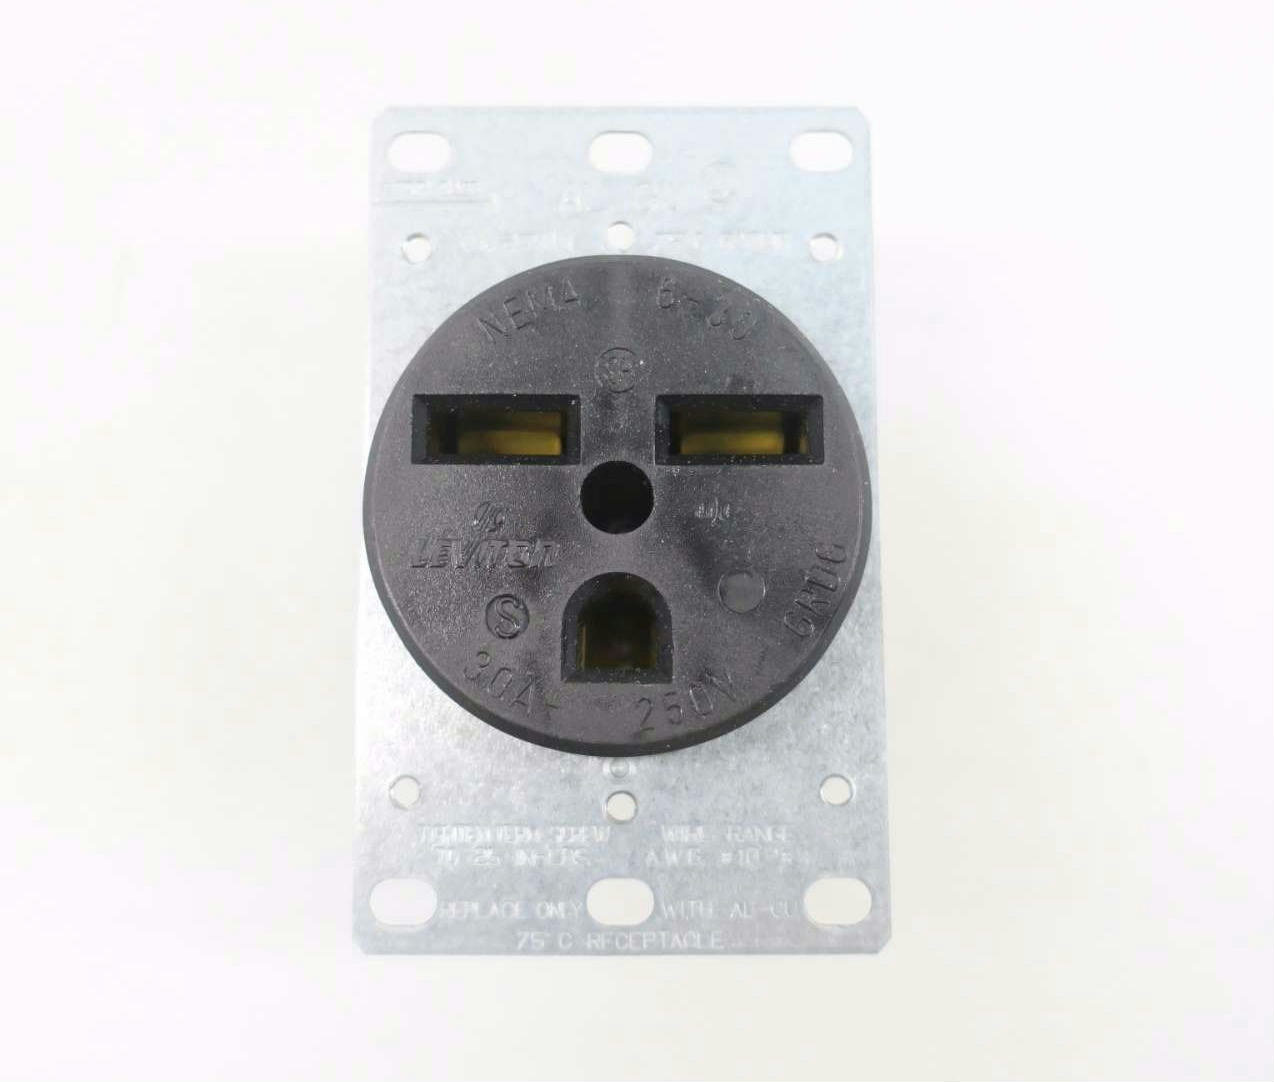 leviton 5372 nema 6 30r 30a 250v 2p 3w black receptacle rh ebay com Leviton CS8264C Leviton Electrical Switches